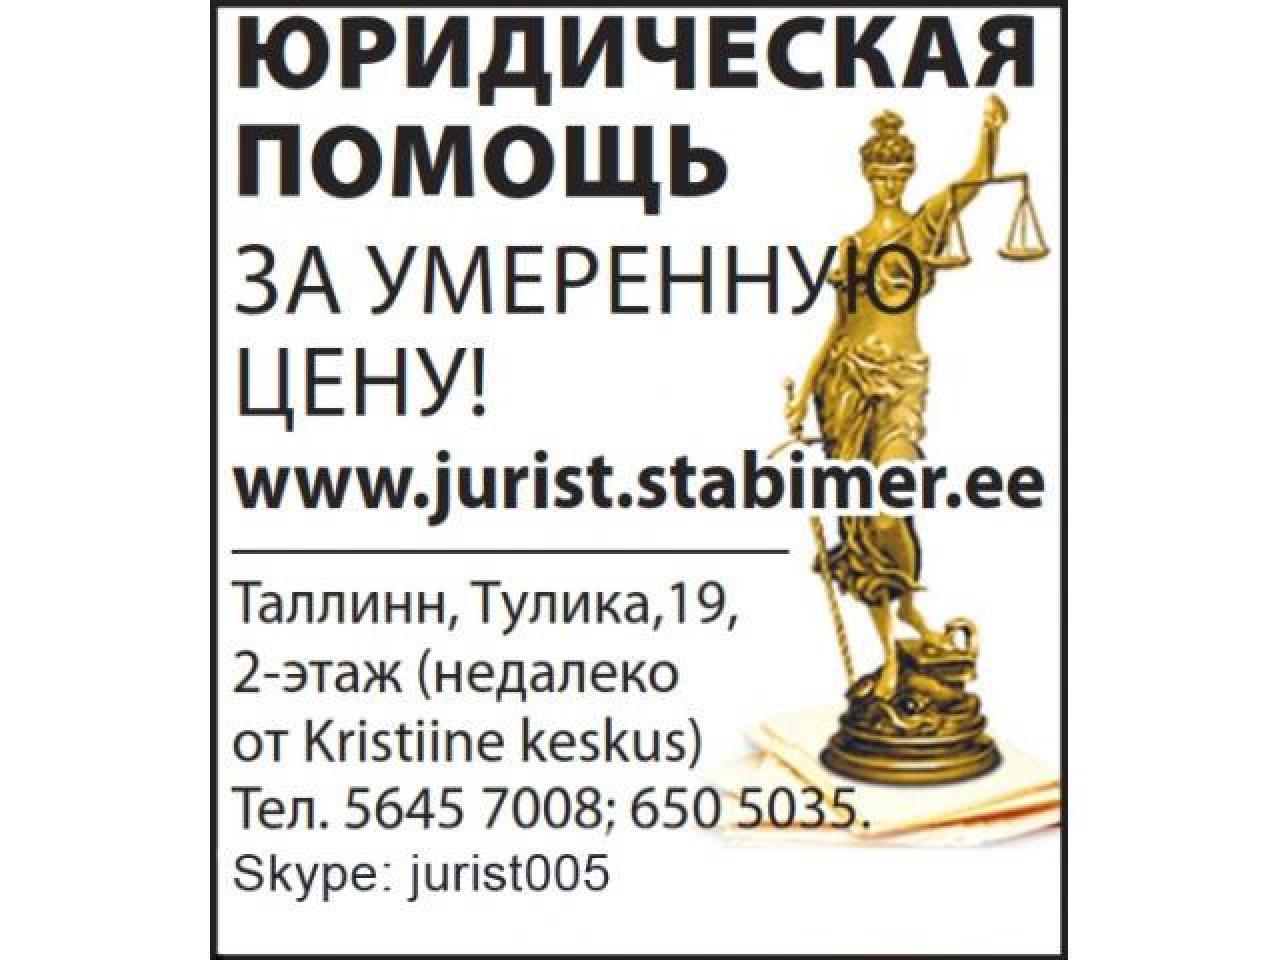 Юрист. Взыскание долга в Эстонии. Услуги юриста. Инкассо услуги. - 2